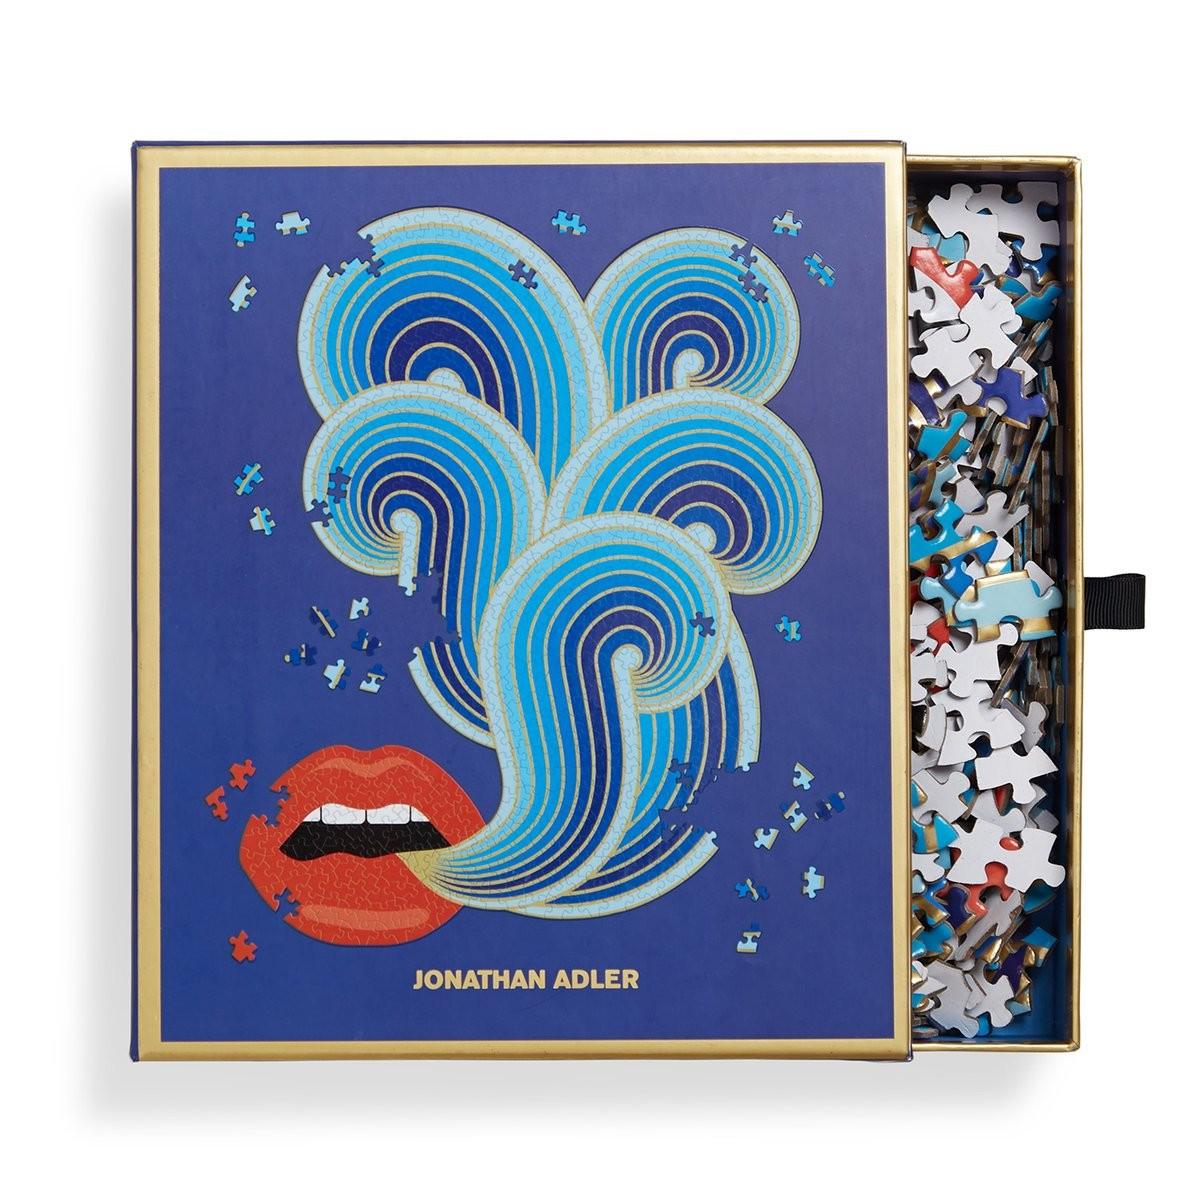 Jonathan Adler I 750 Lips Piece Puzzle